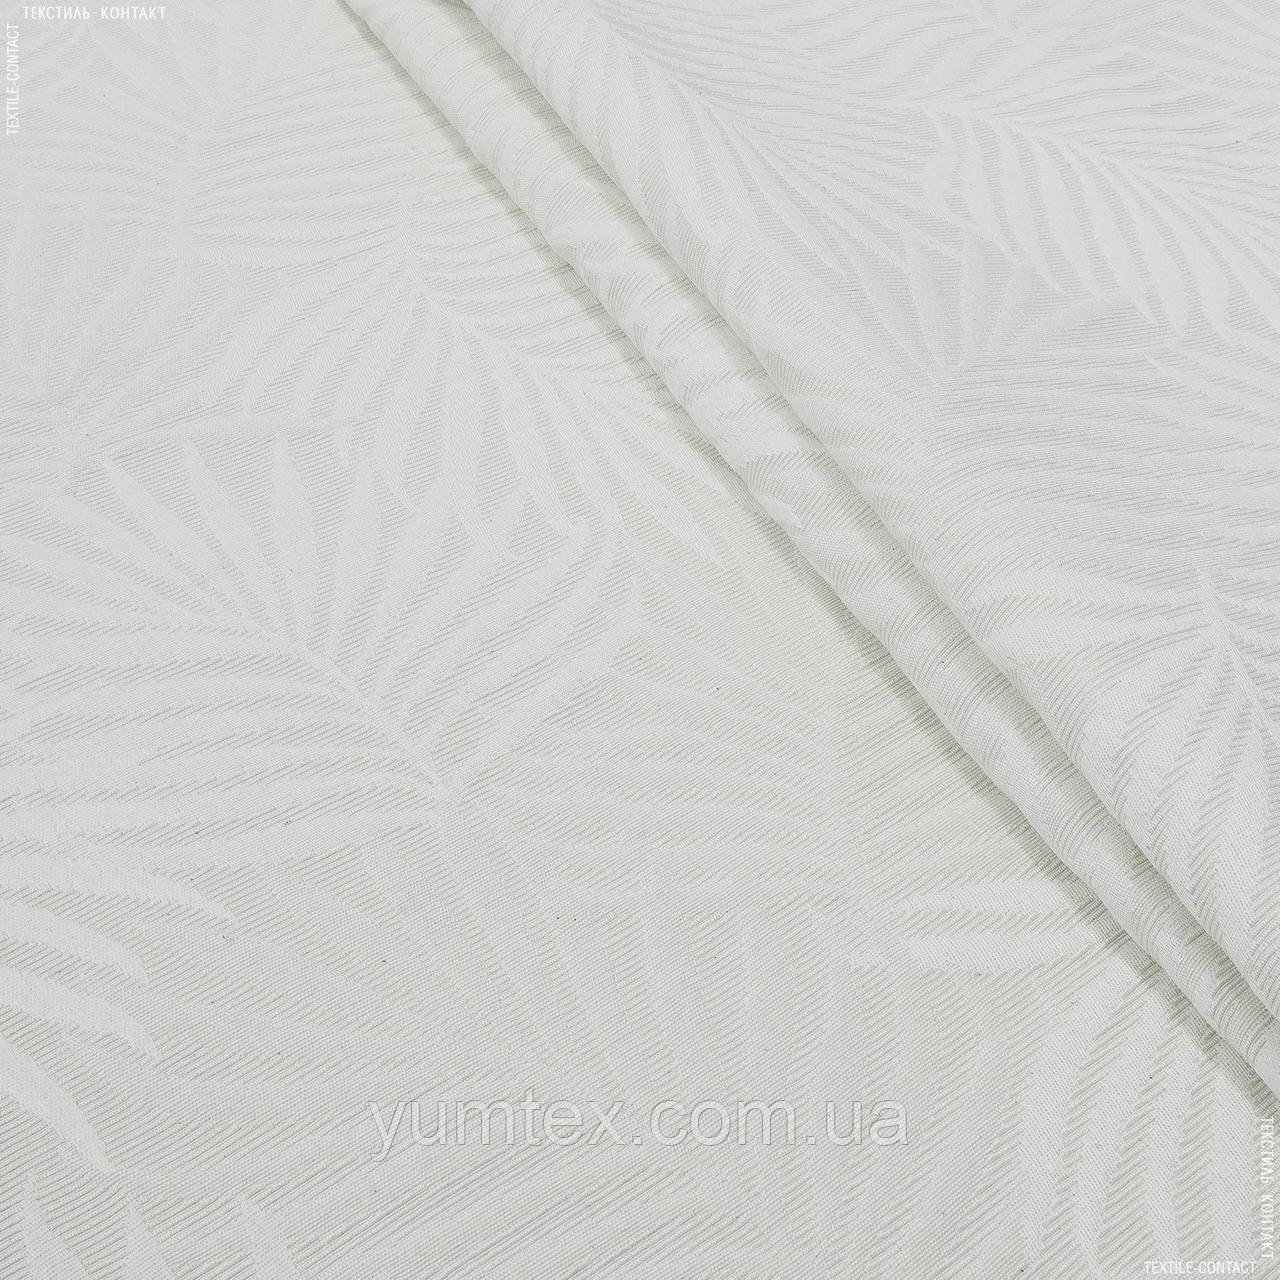 Жаккард блазер / bleser 135534